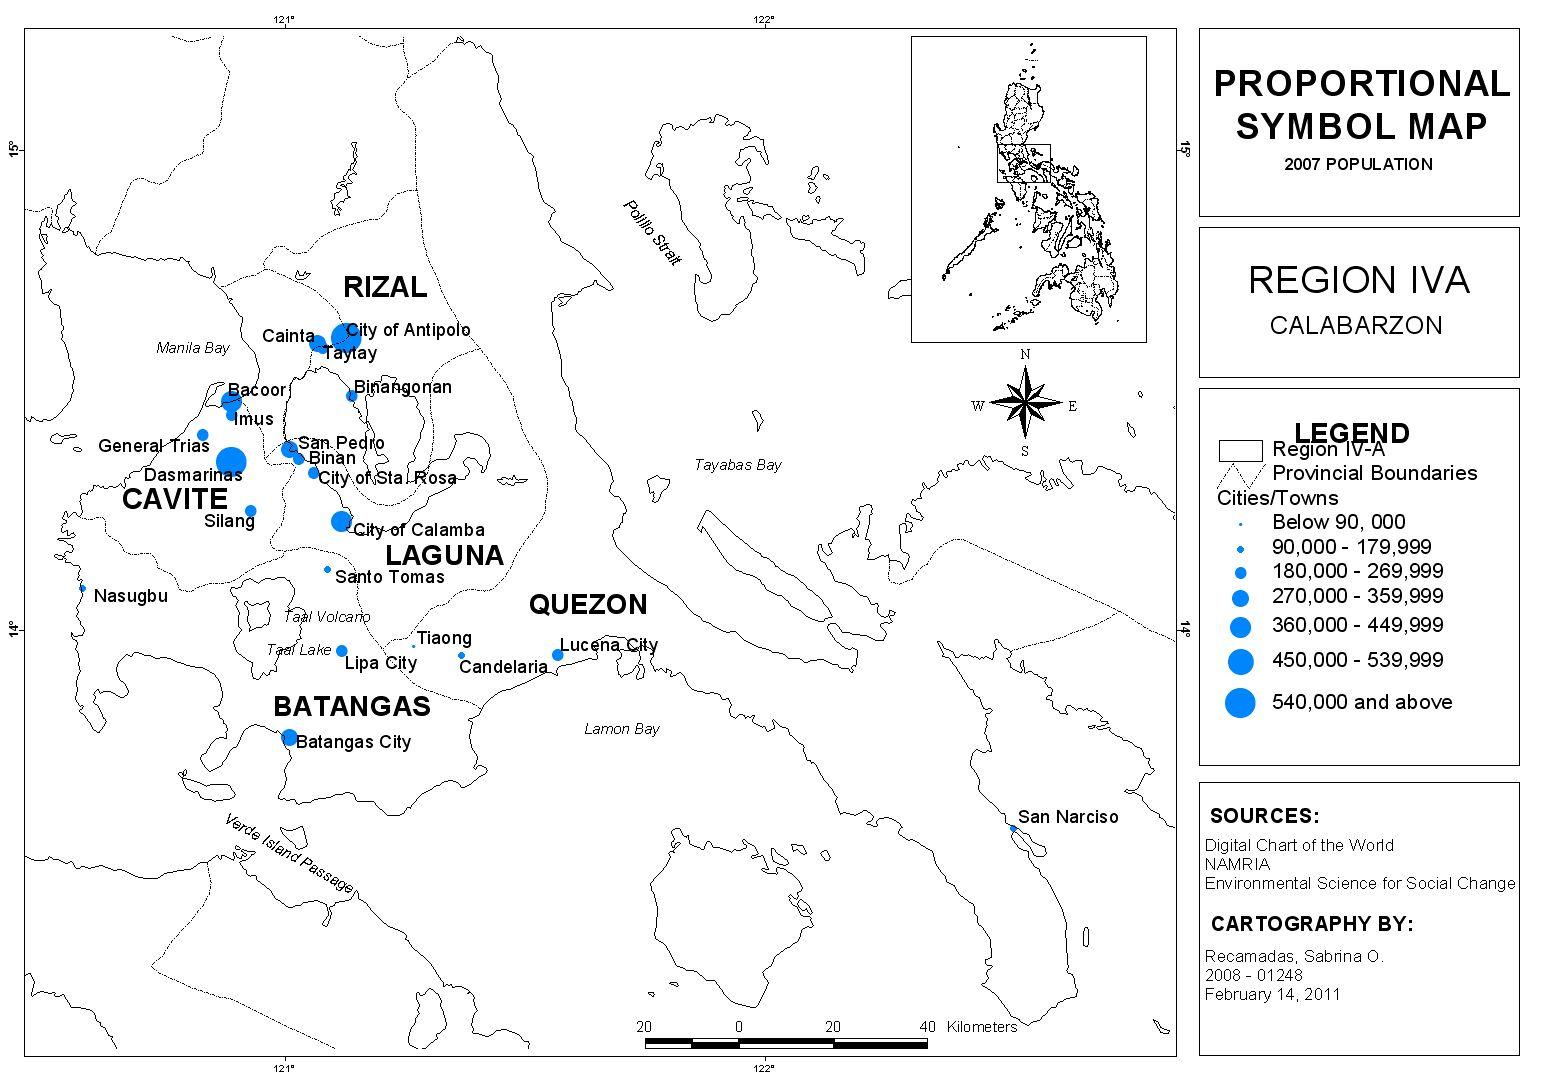 Sab S World Proportional Symbol Map Of Calabarzon